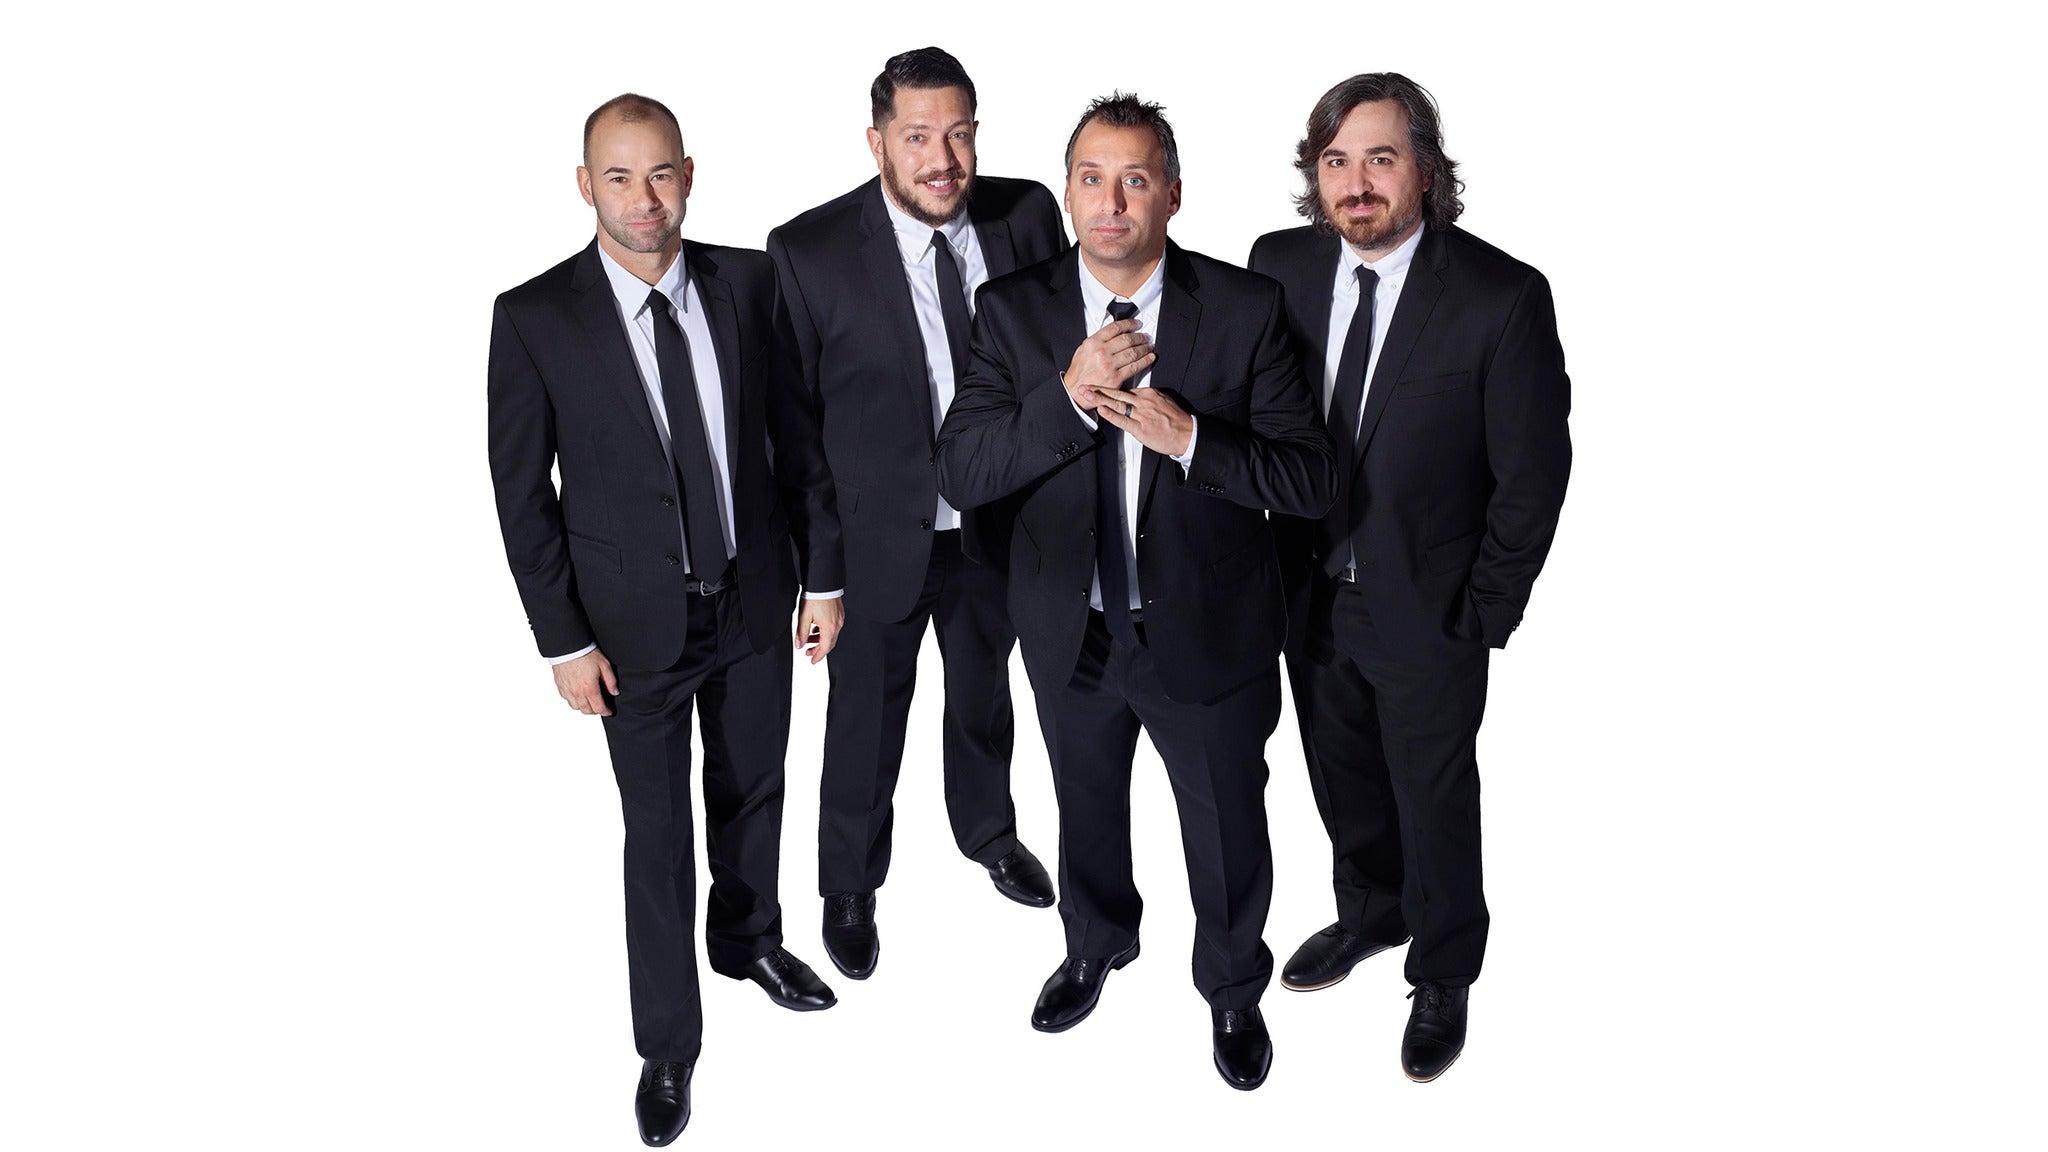 Impractical Jokers 'Santiago Sent Us' Tour Starring The Tenderloins